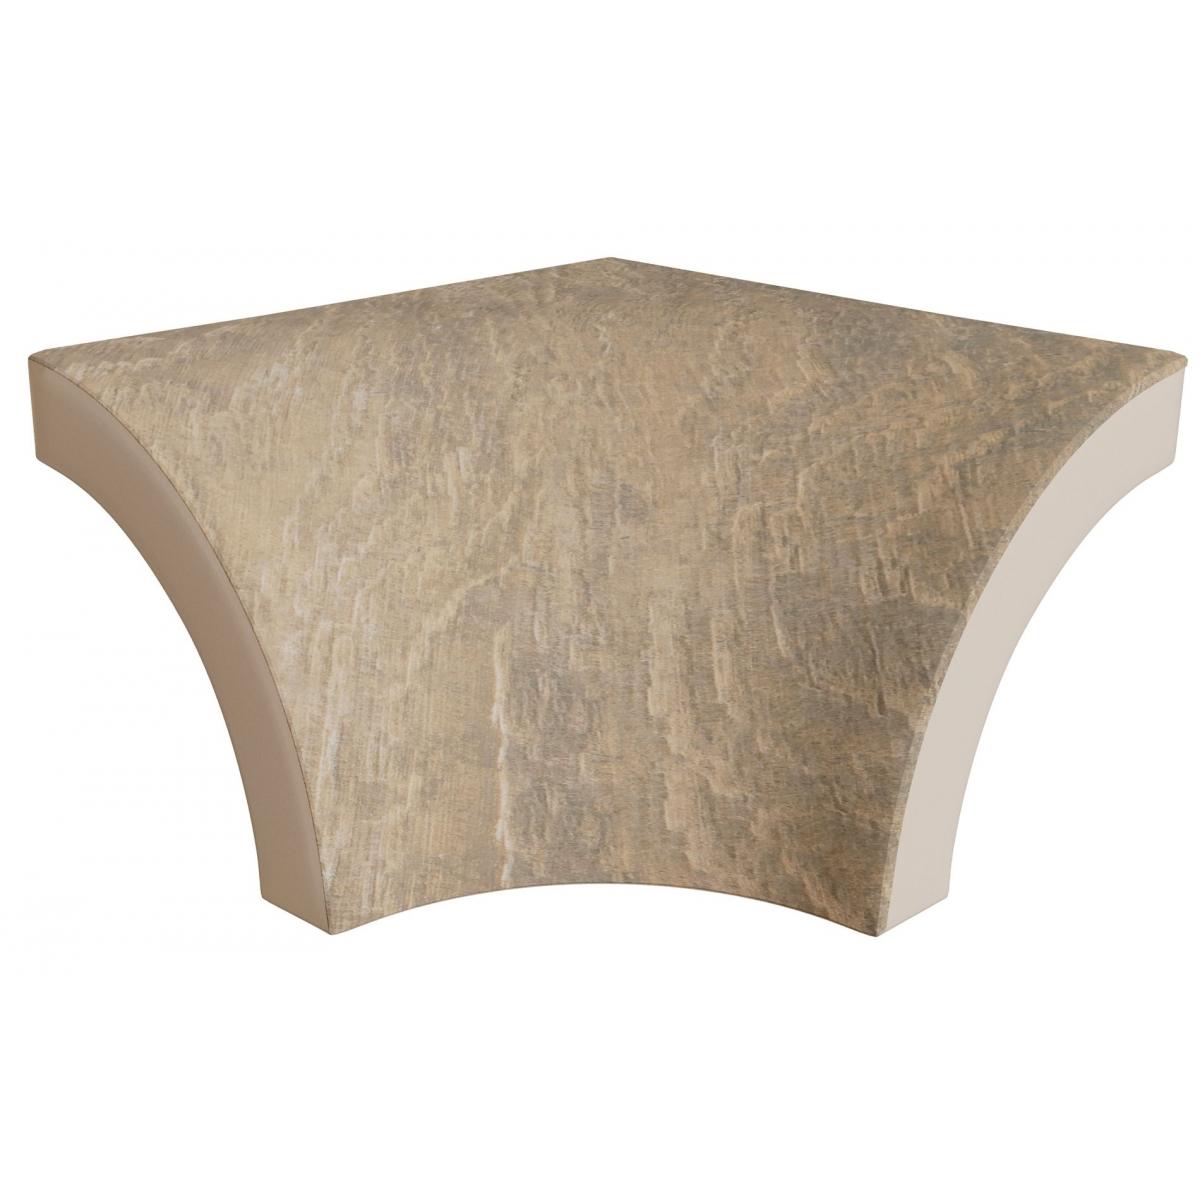 Rinconera exterior Stela Grey 4x4